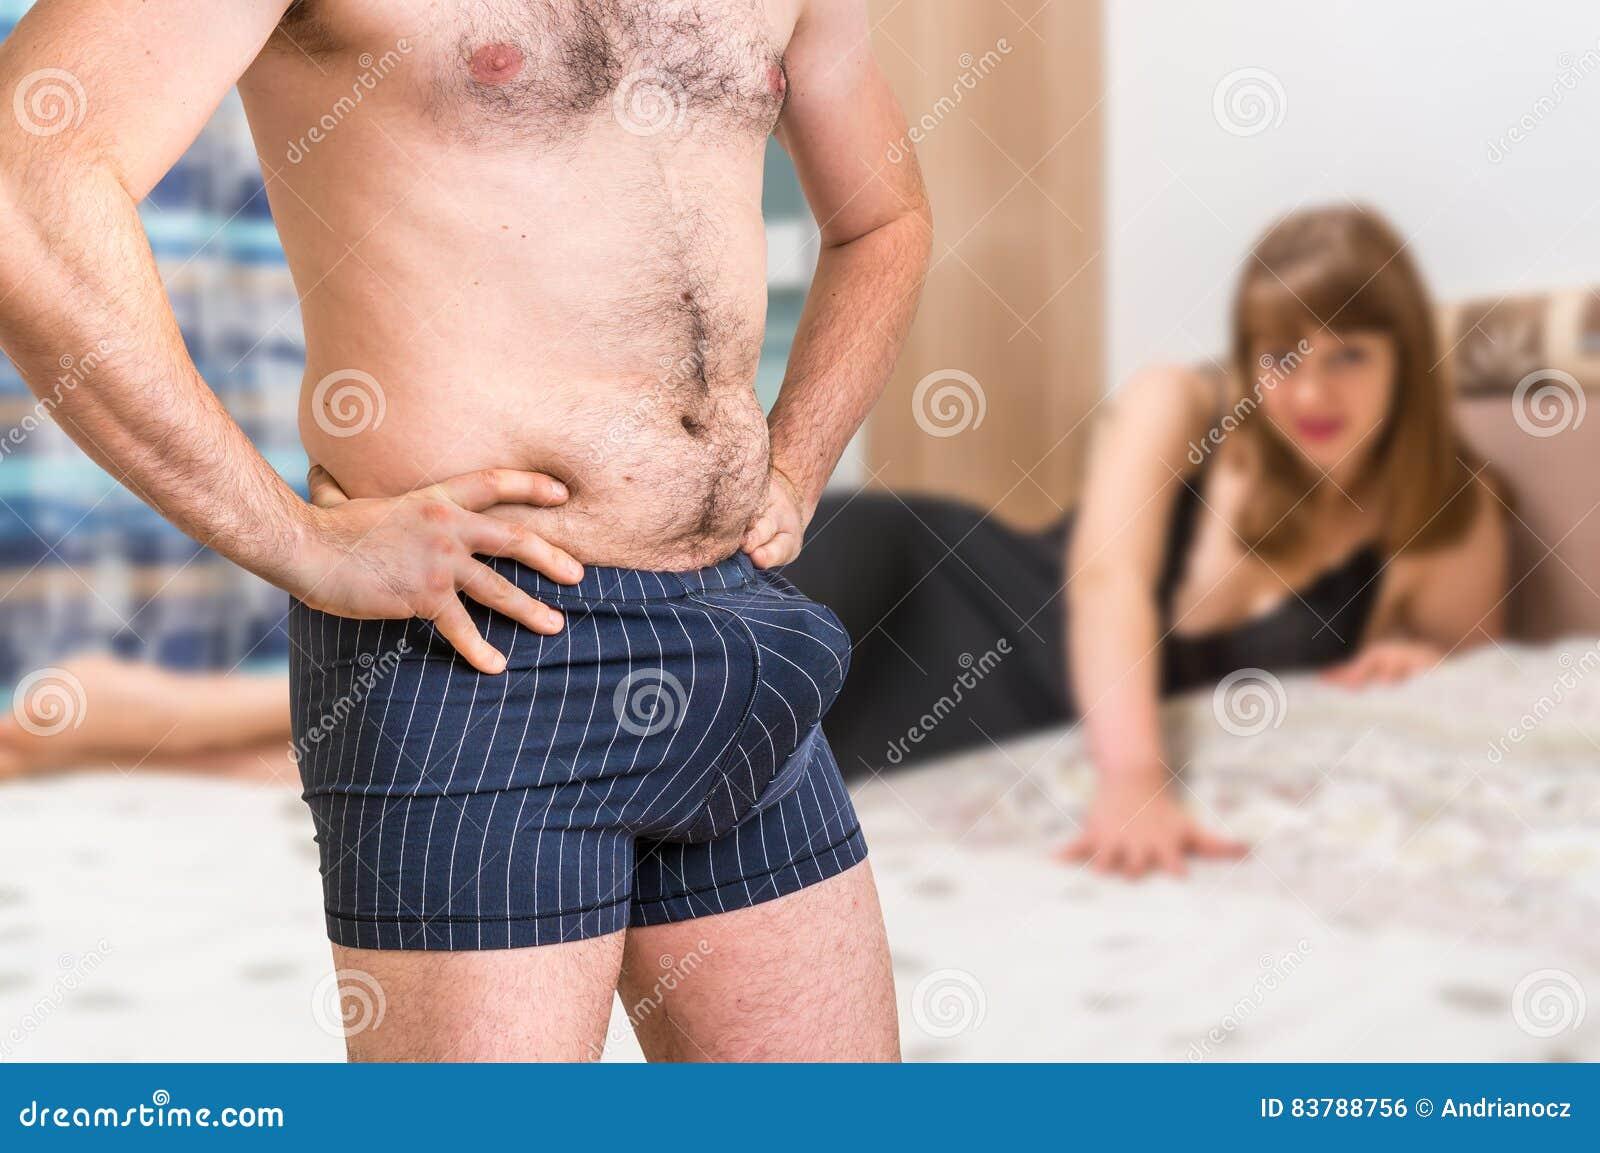 mangiare figa film porno